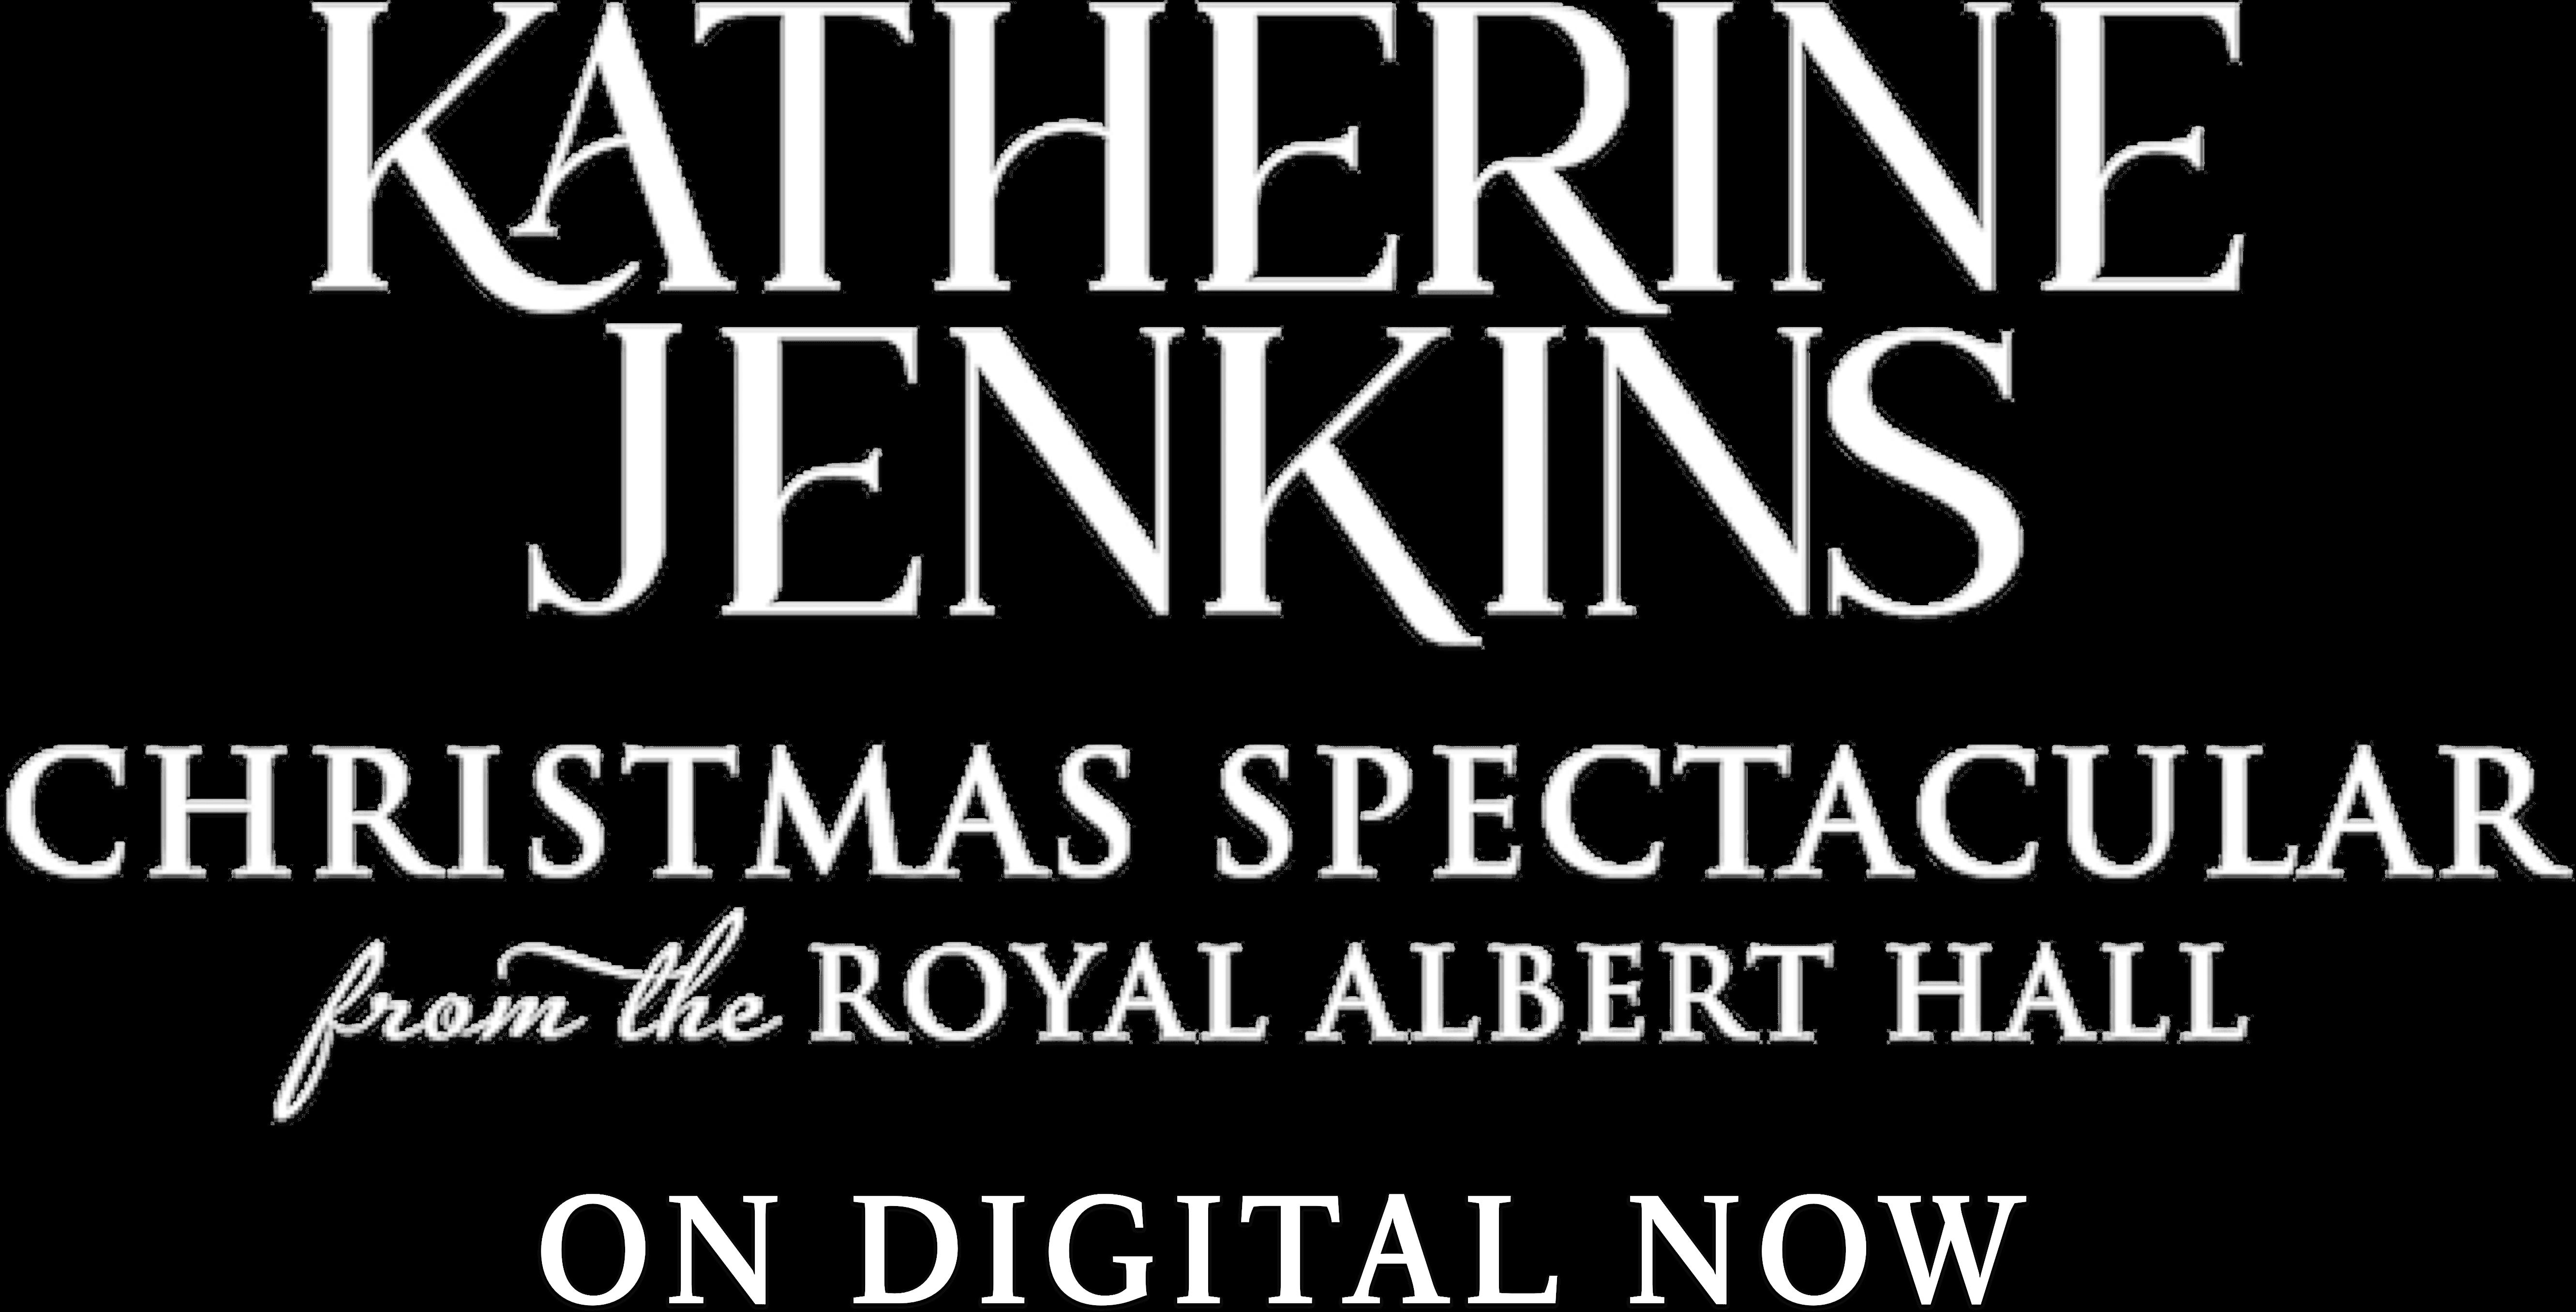 Katherine Jenkins Christmas Spectacular